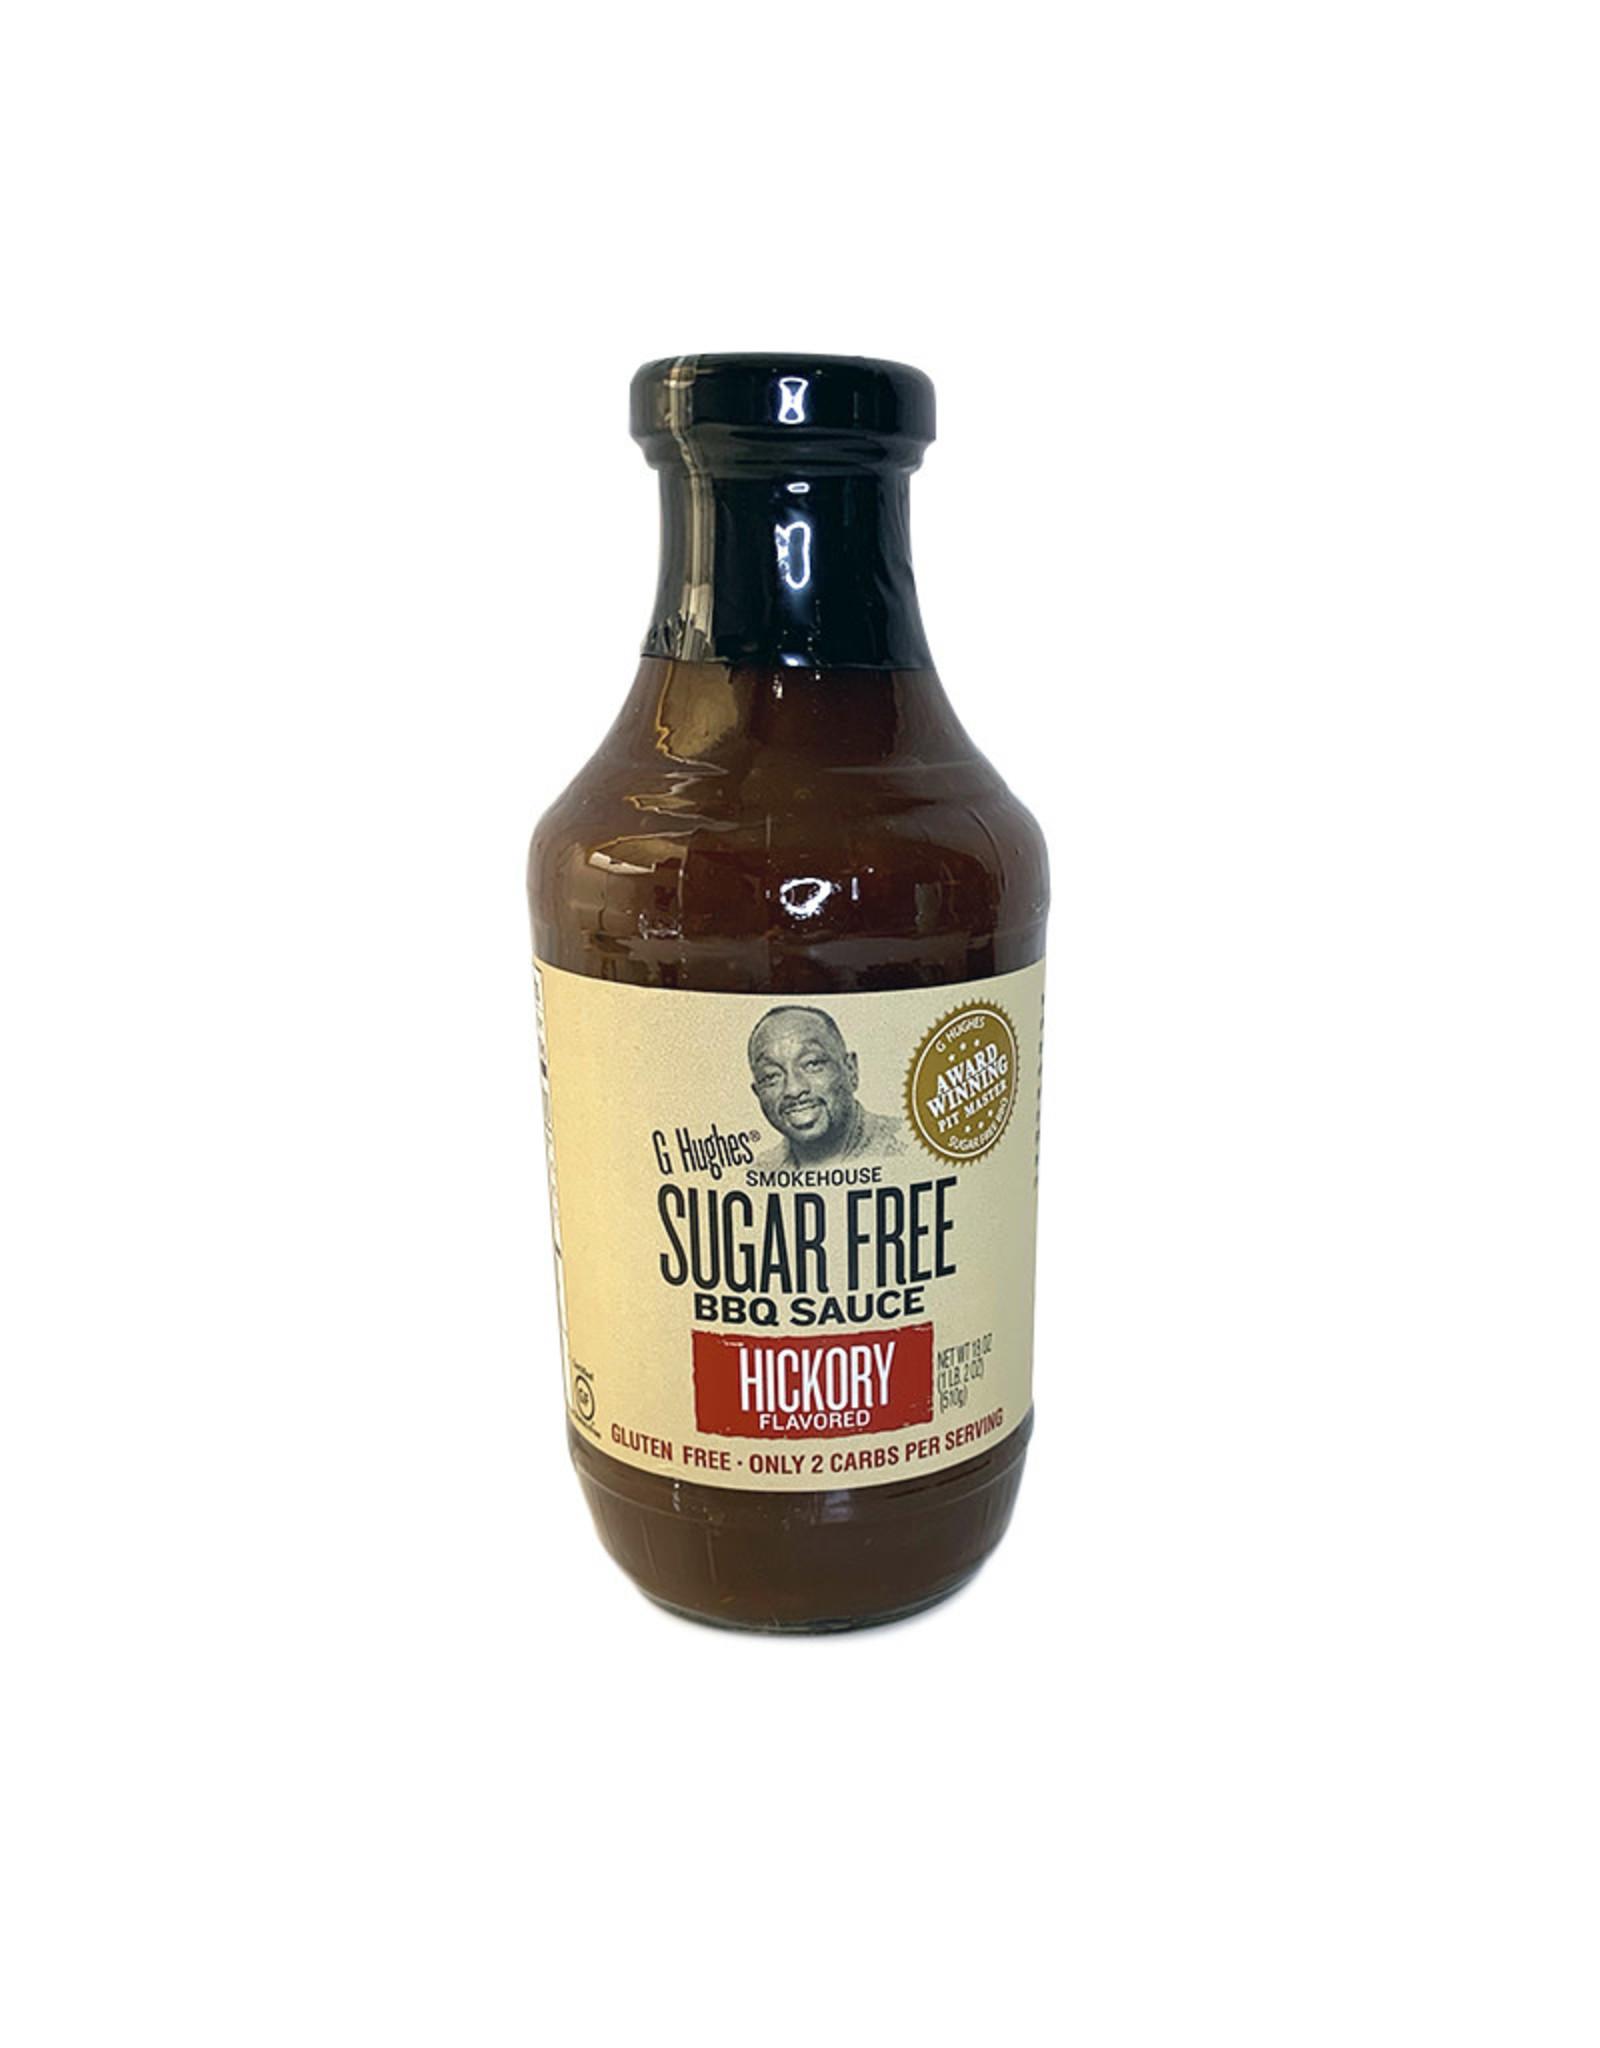 G. Hughes G. Hughes - Sugar Free BBQ Sauce, Hickory (510g)